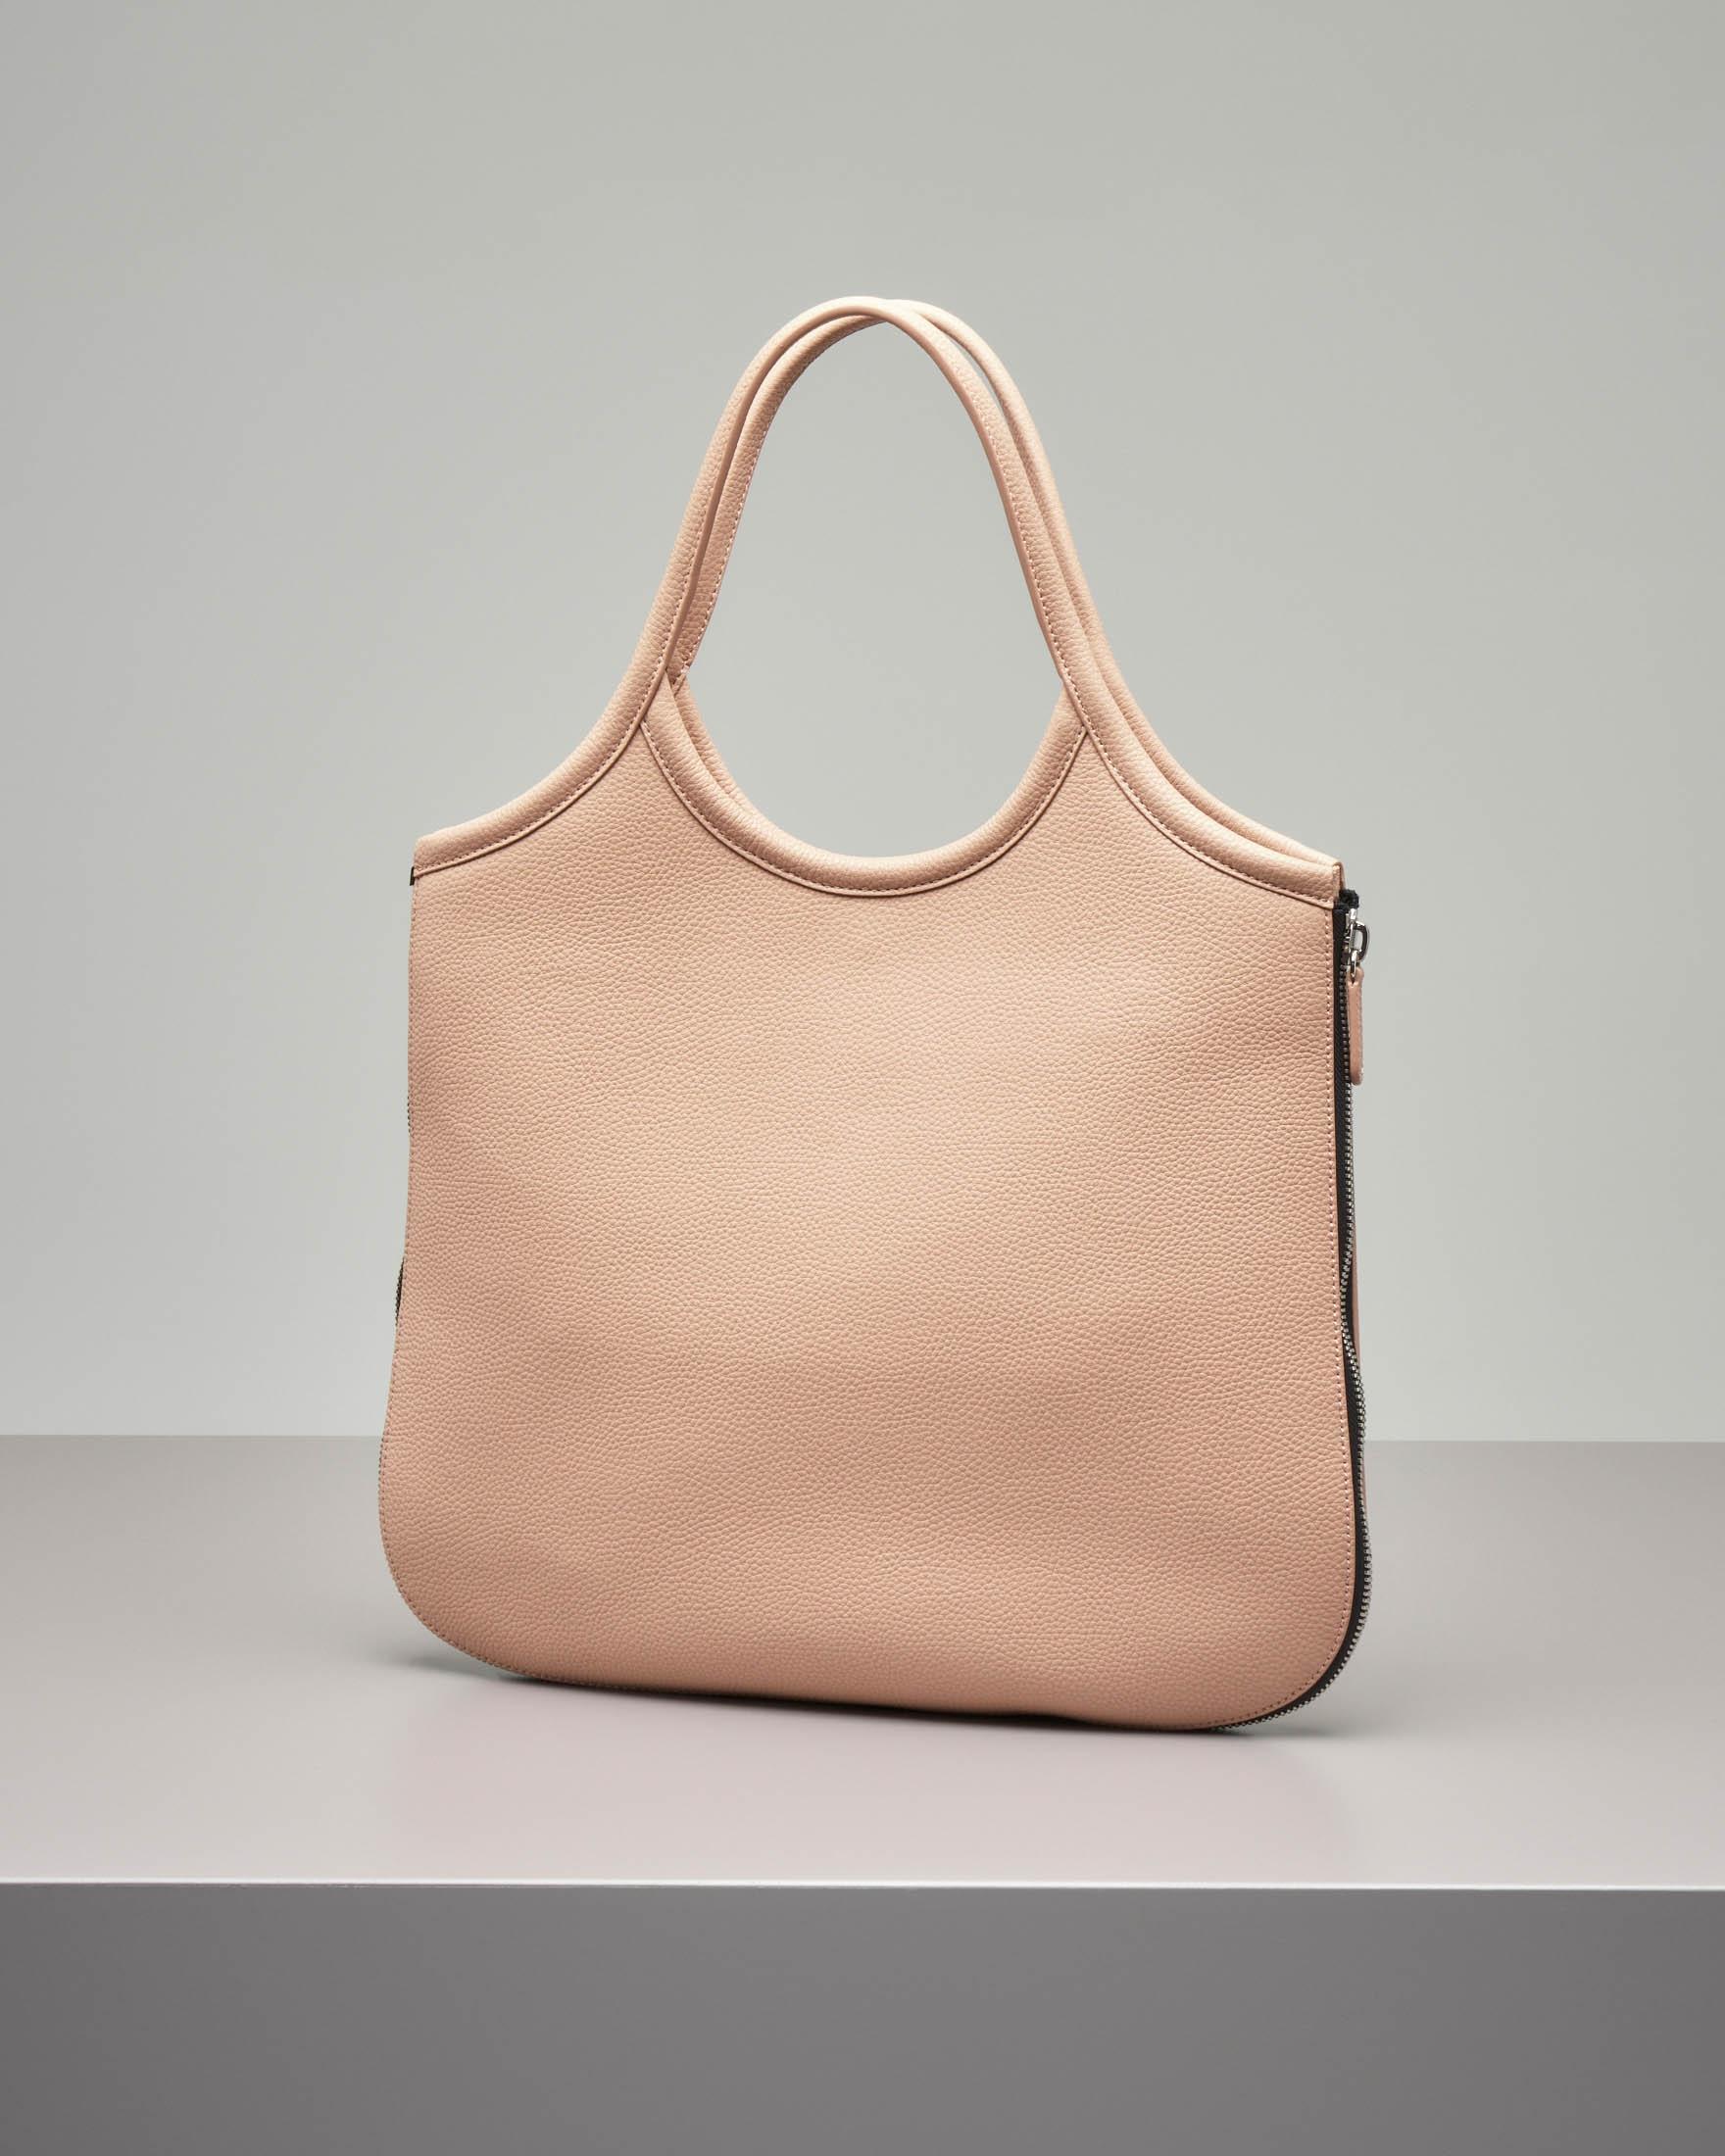 Borsa hobo in pelle color rosa